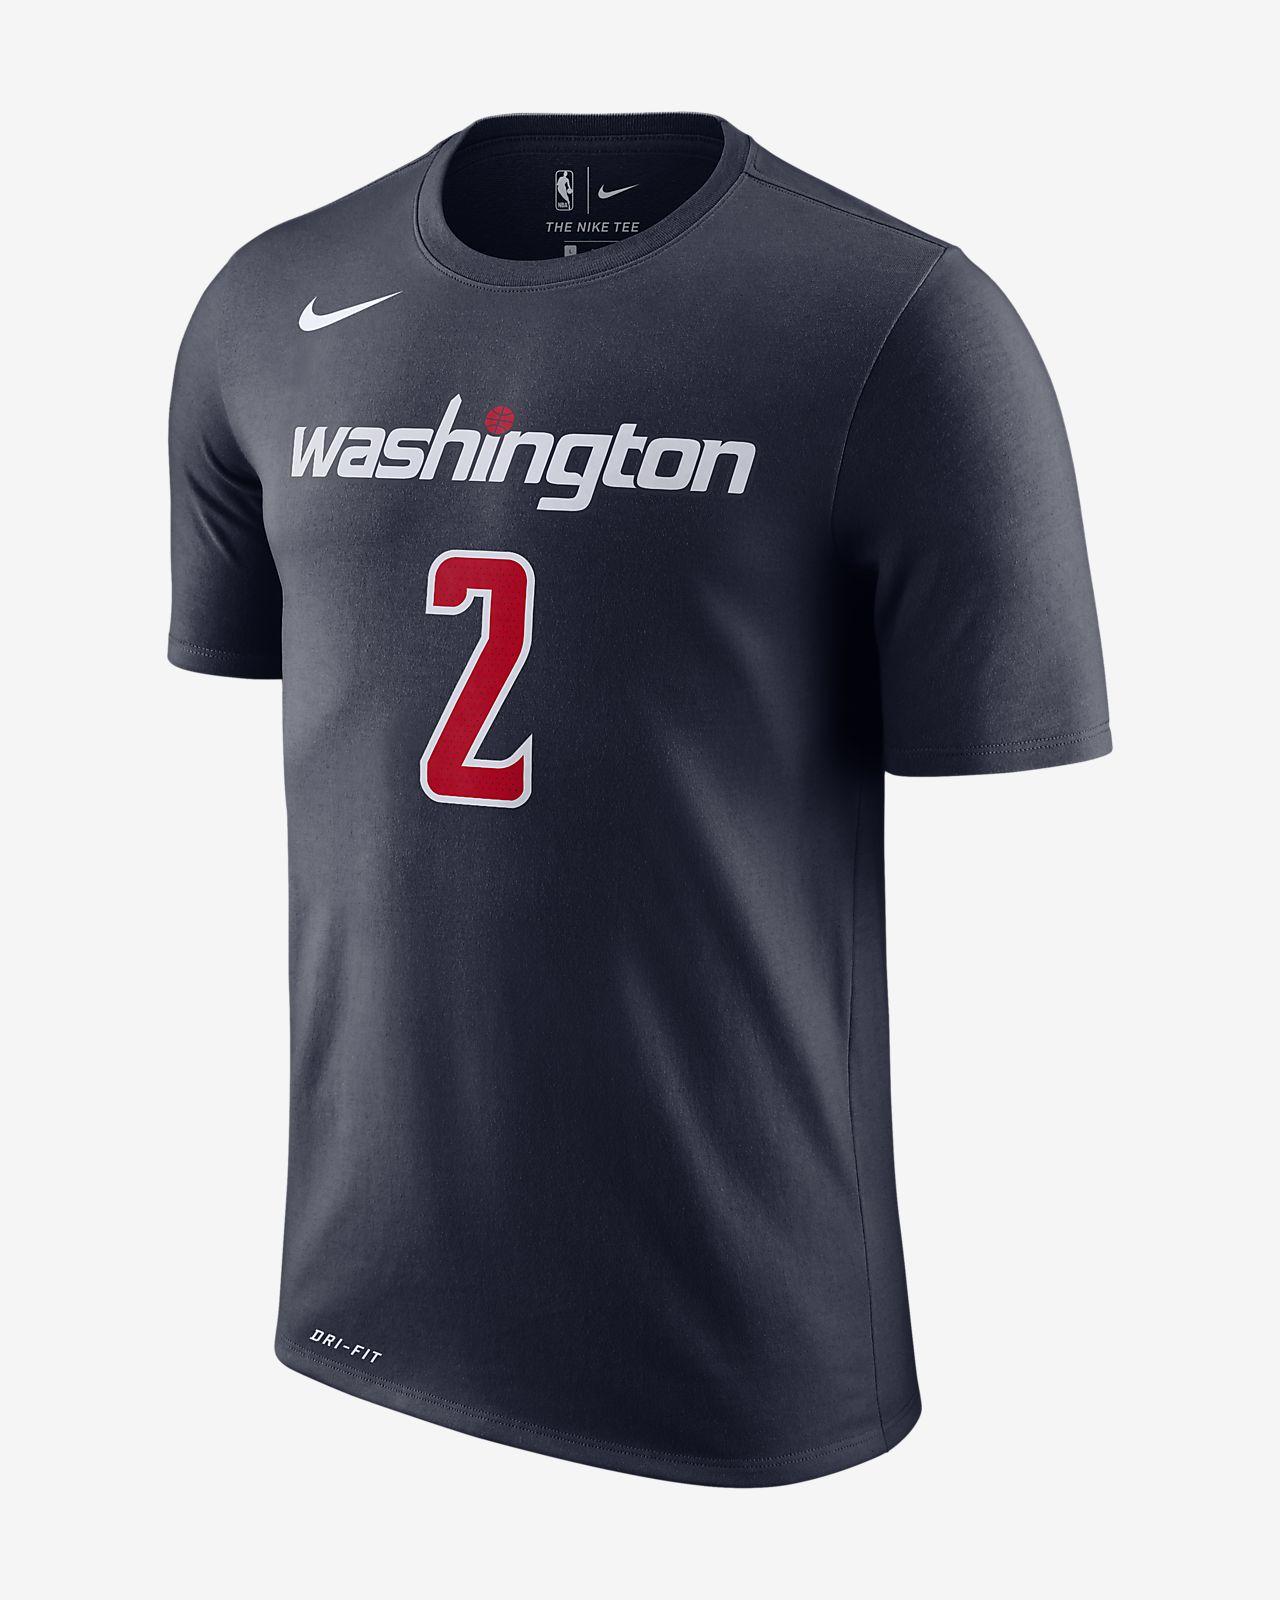 华盛顿奇才队 (John Wall) Nike Dry NBA 男子T恤